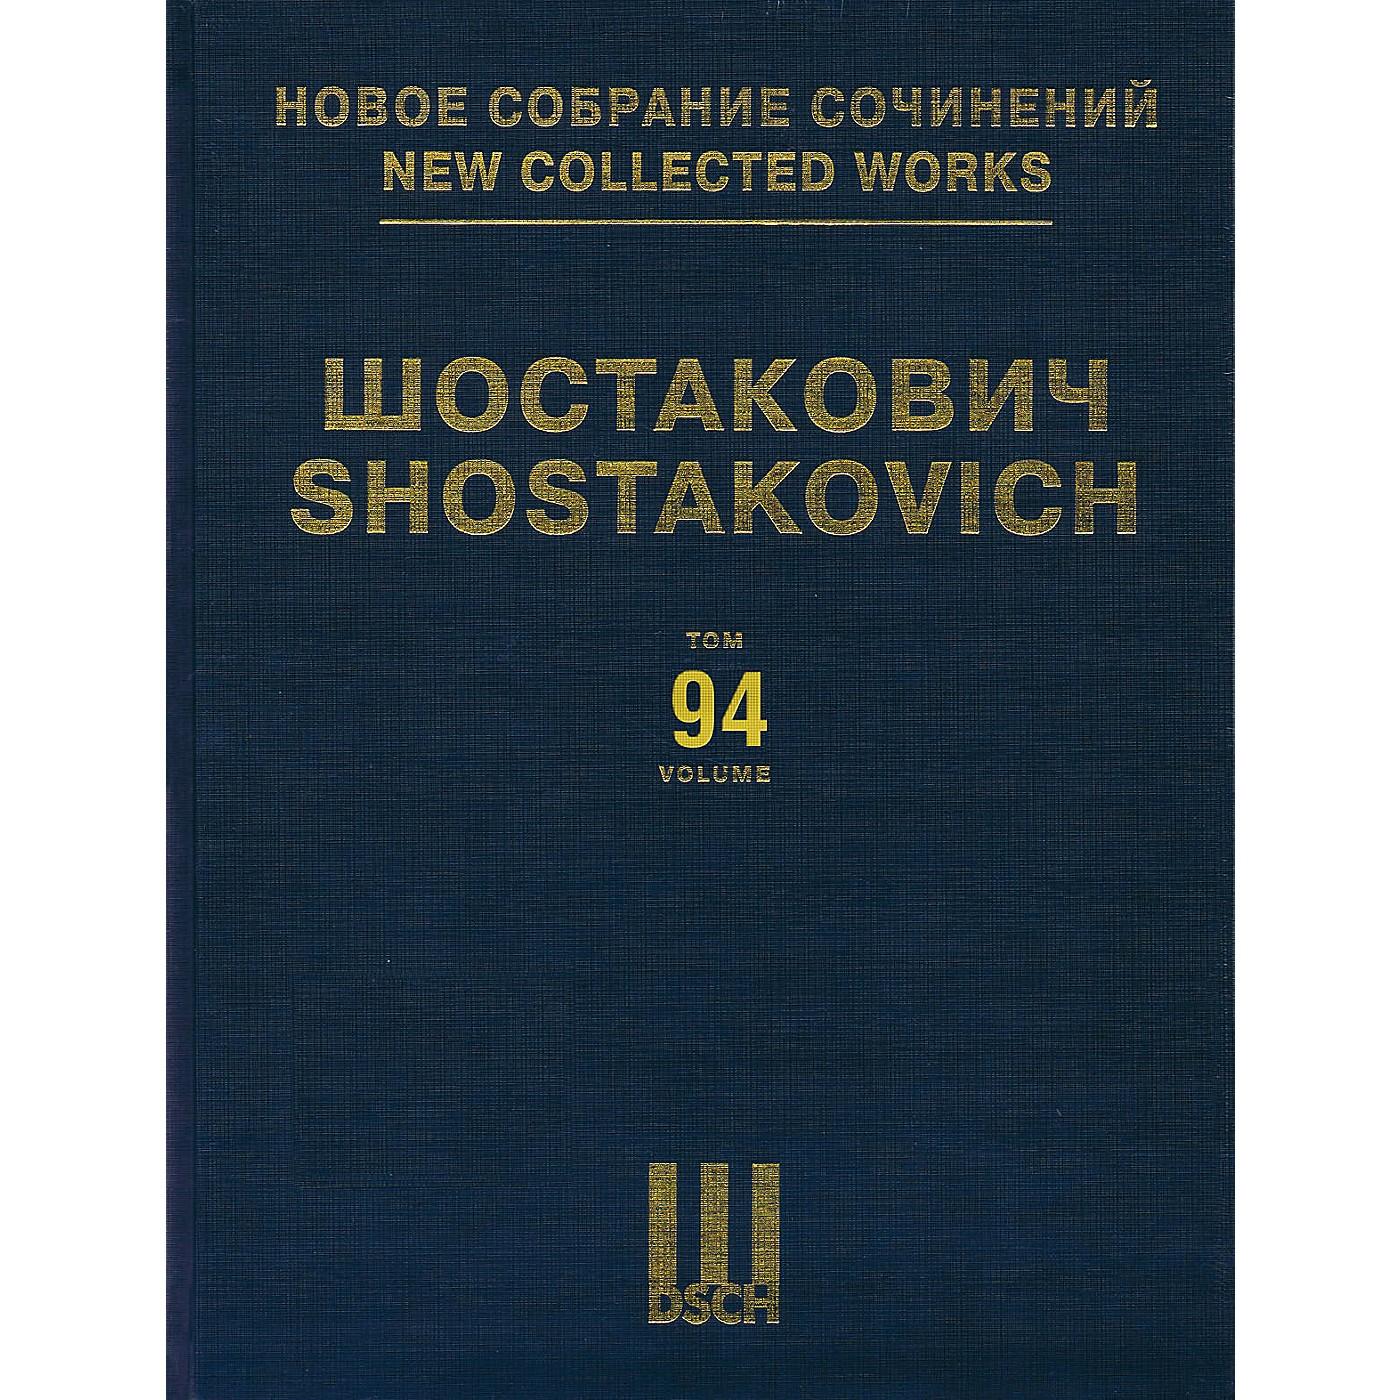 DSCH New Collected Works of Dmitri Shostakovich - Volume 94 DSCH Series Hardcover by Dmitri Shostakovich thumbnail